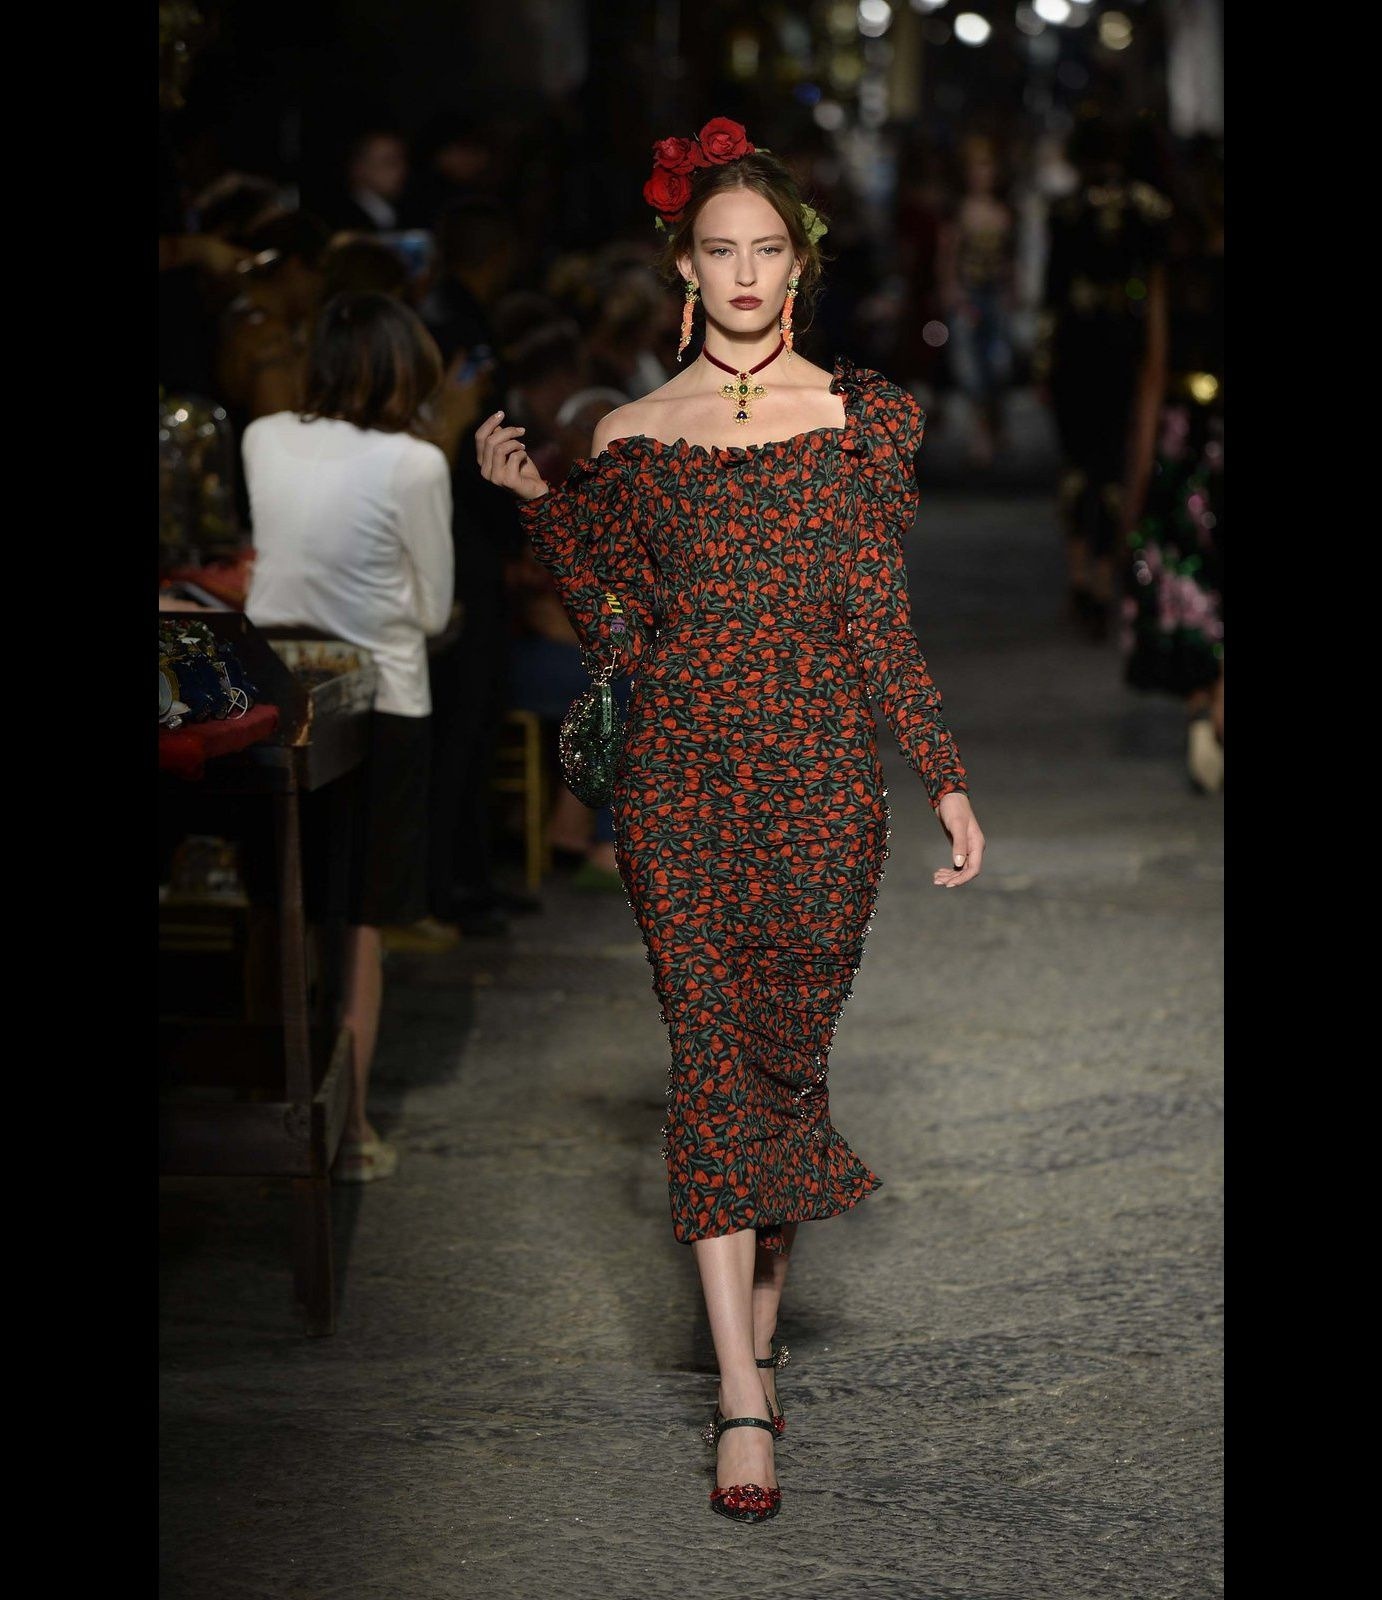 Dolce & Gabbana Alta Moda - Monica Bellucci / Penelope Cruz / Helen Mirren / Diane Kruger / Nicole Kidman / Amy Adams / Jessica Chastain